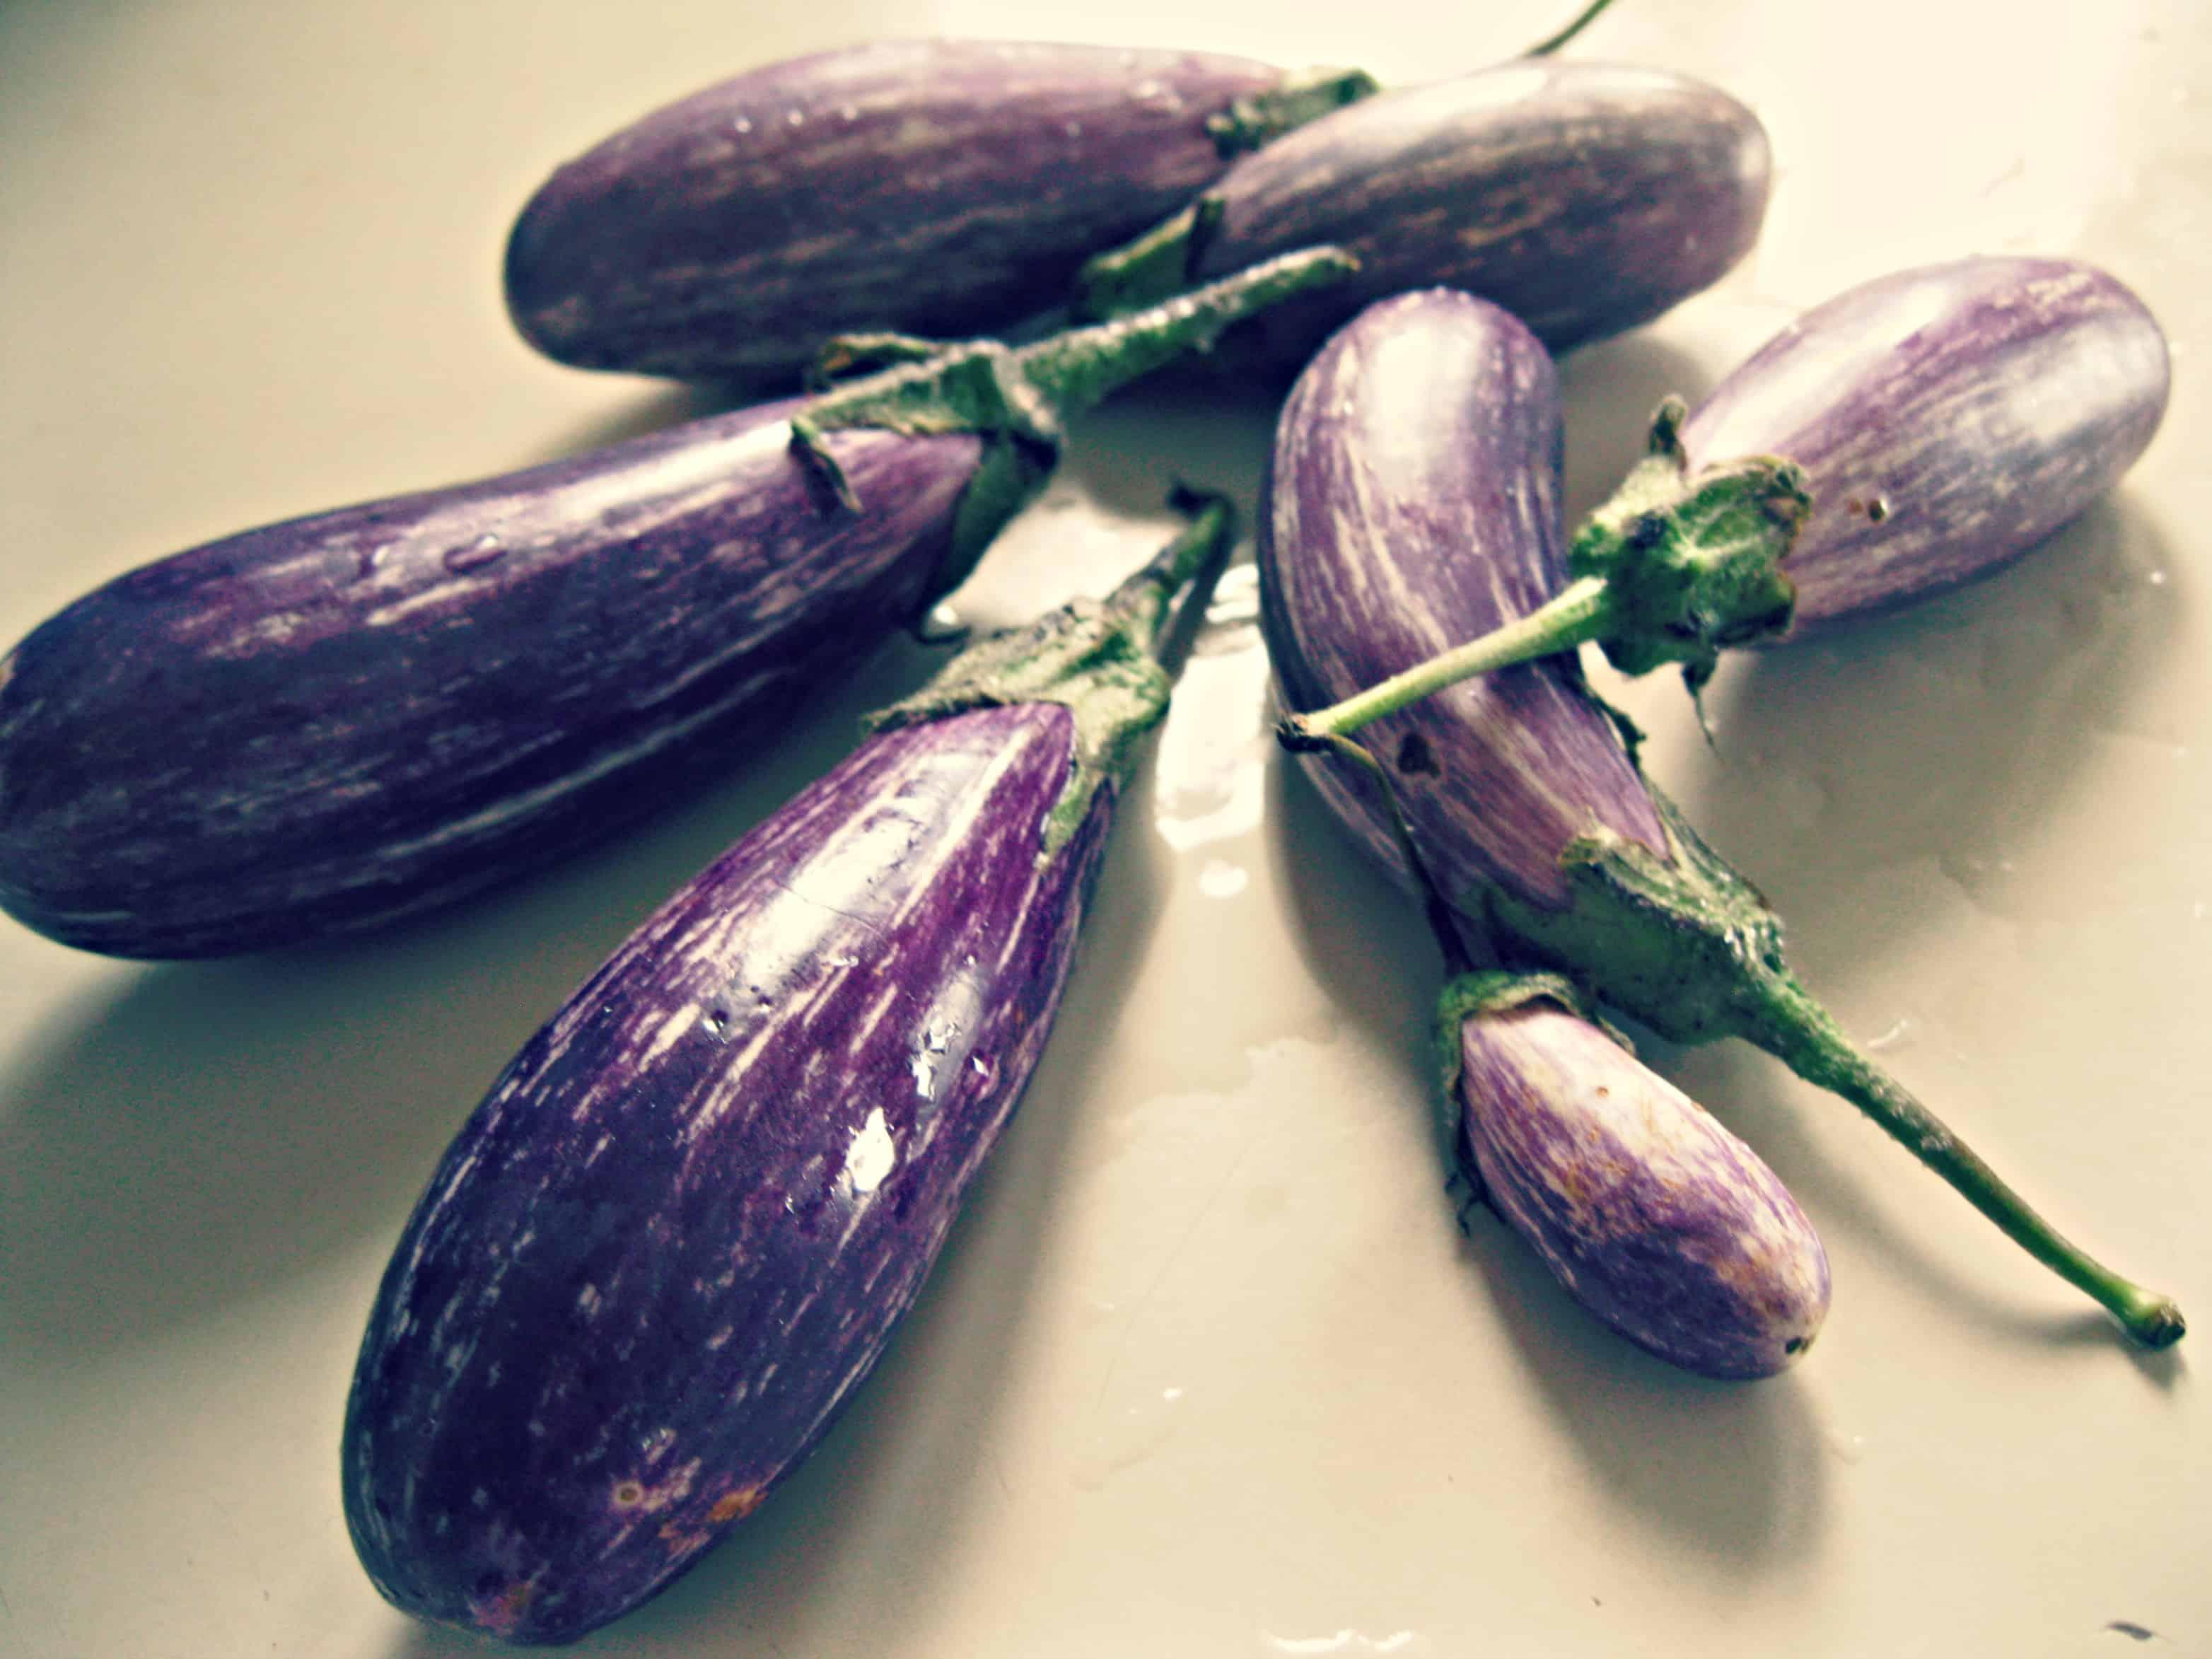 A half dozen fairytale eggplant on a counter.